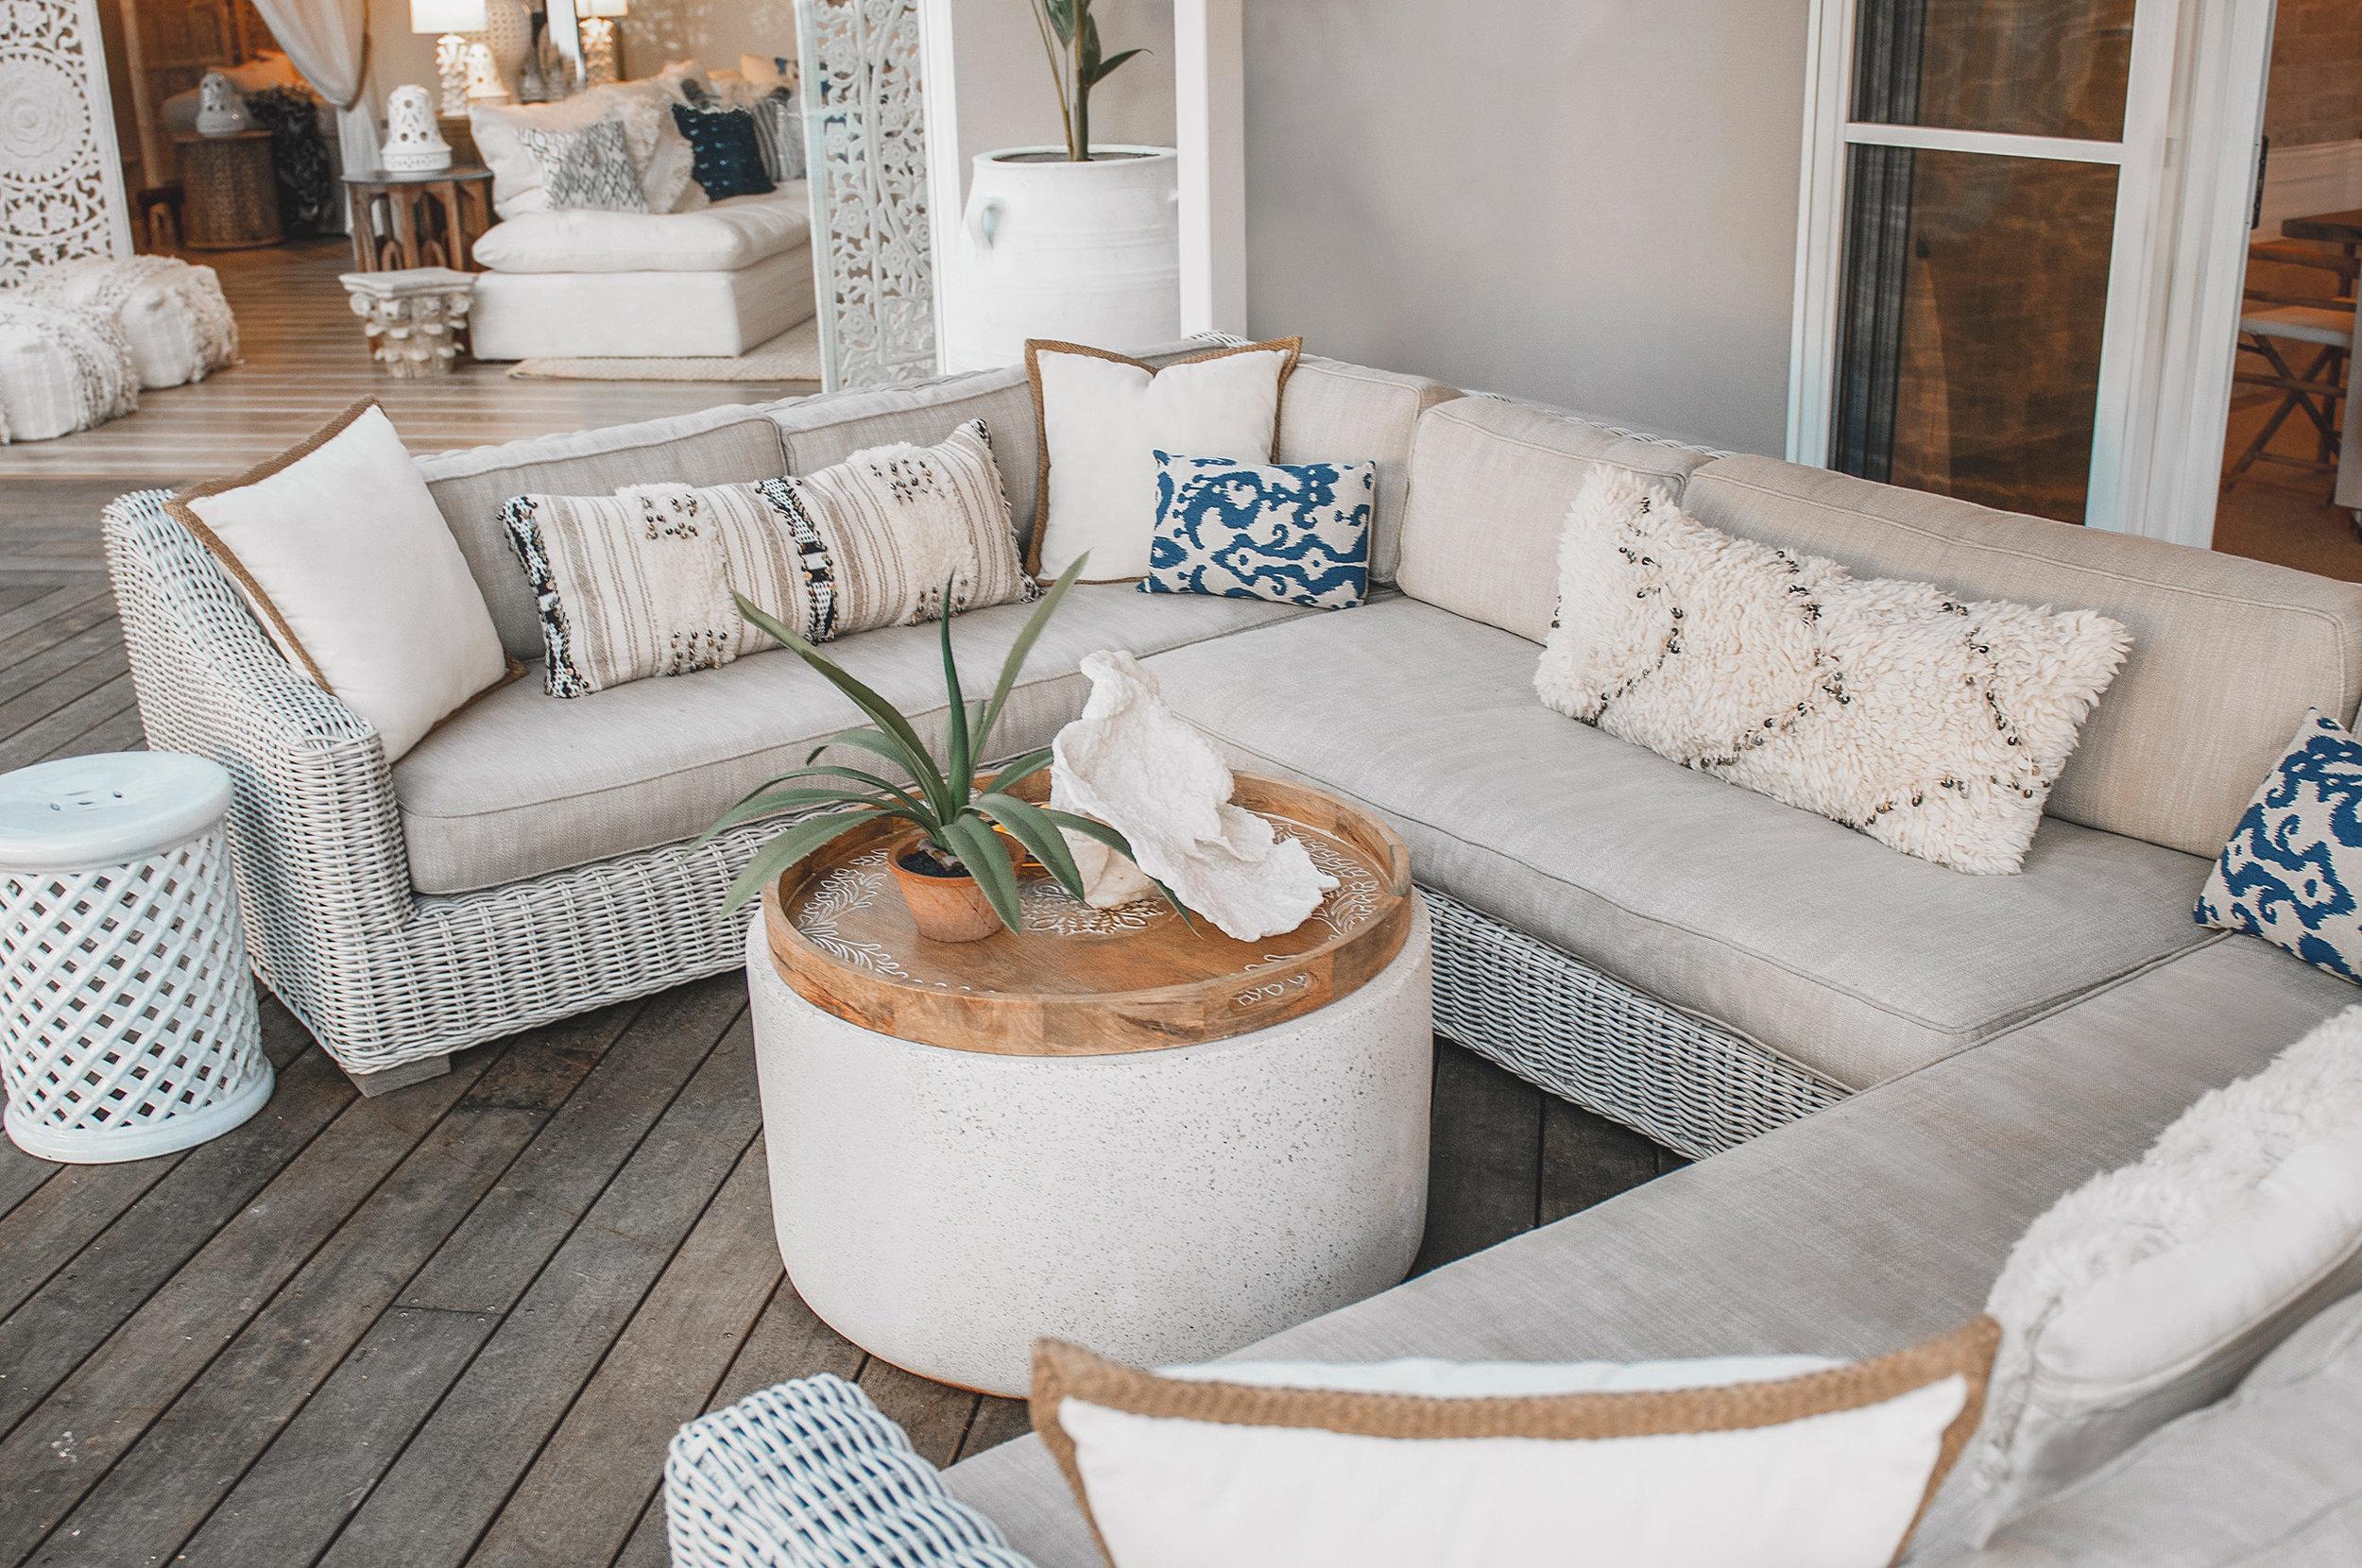 Barellen-2f-Beach-Side-Deck---Sofa-Lounge-DSC_6533.jpg